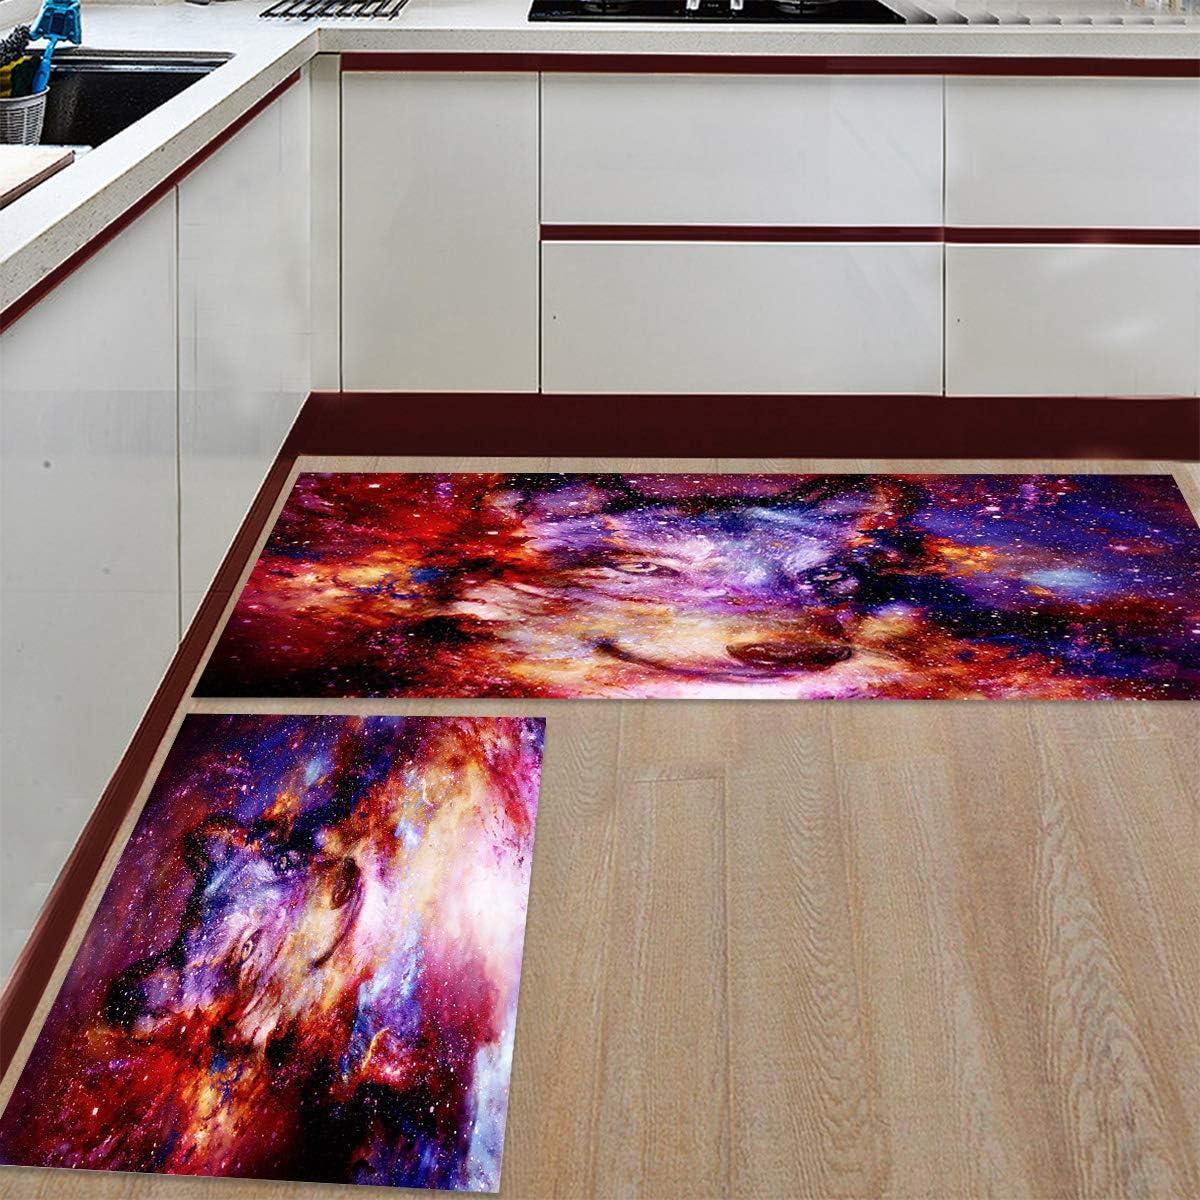 Advancey 2 Pieces Anti-Slip Max 77% OFF Import Kitchen Beautiful Dreamy Starry Mats